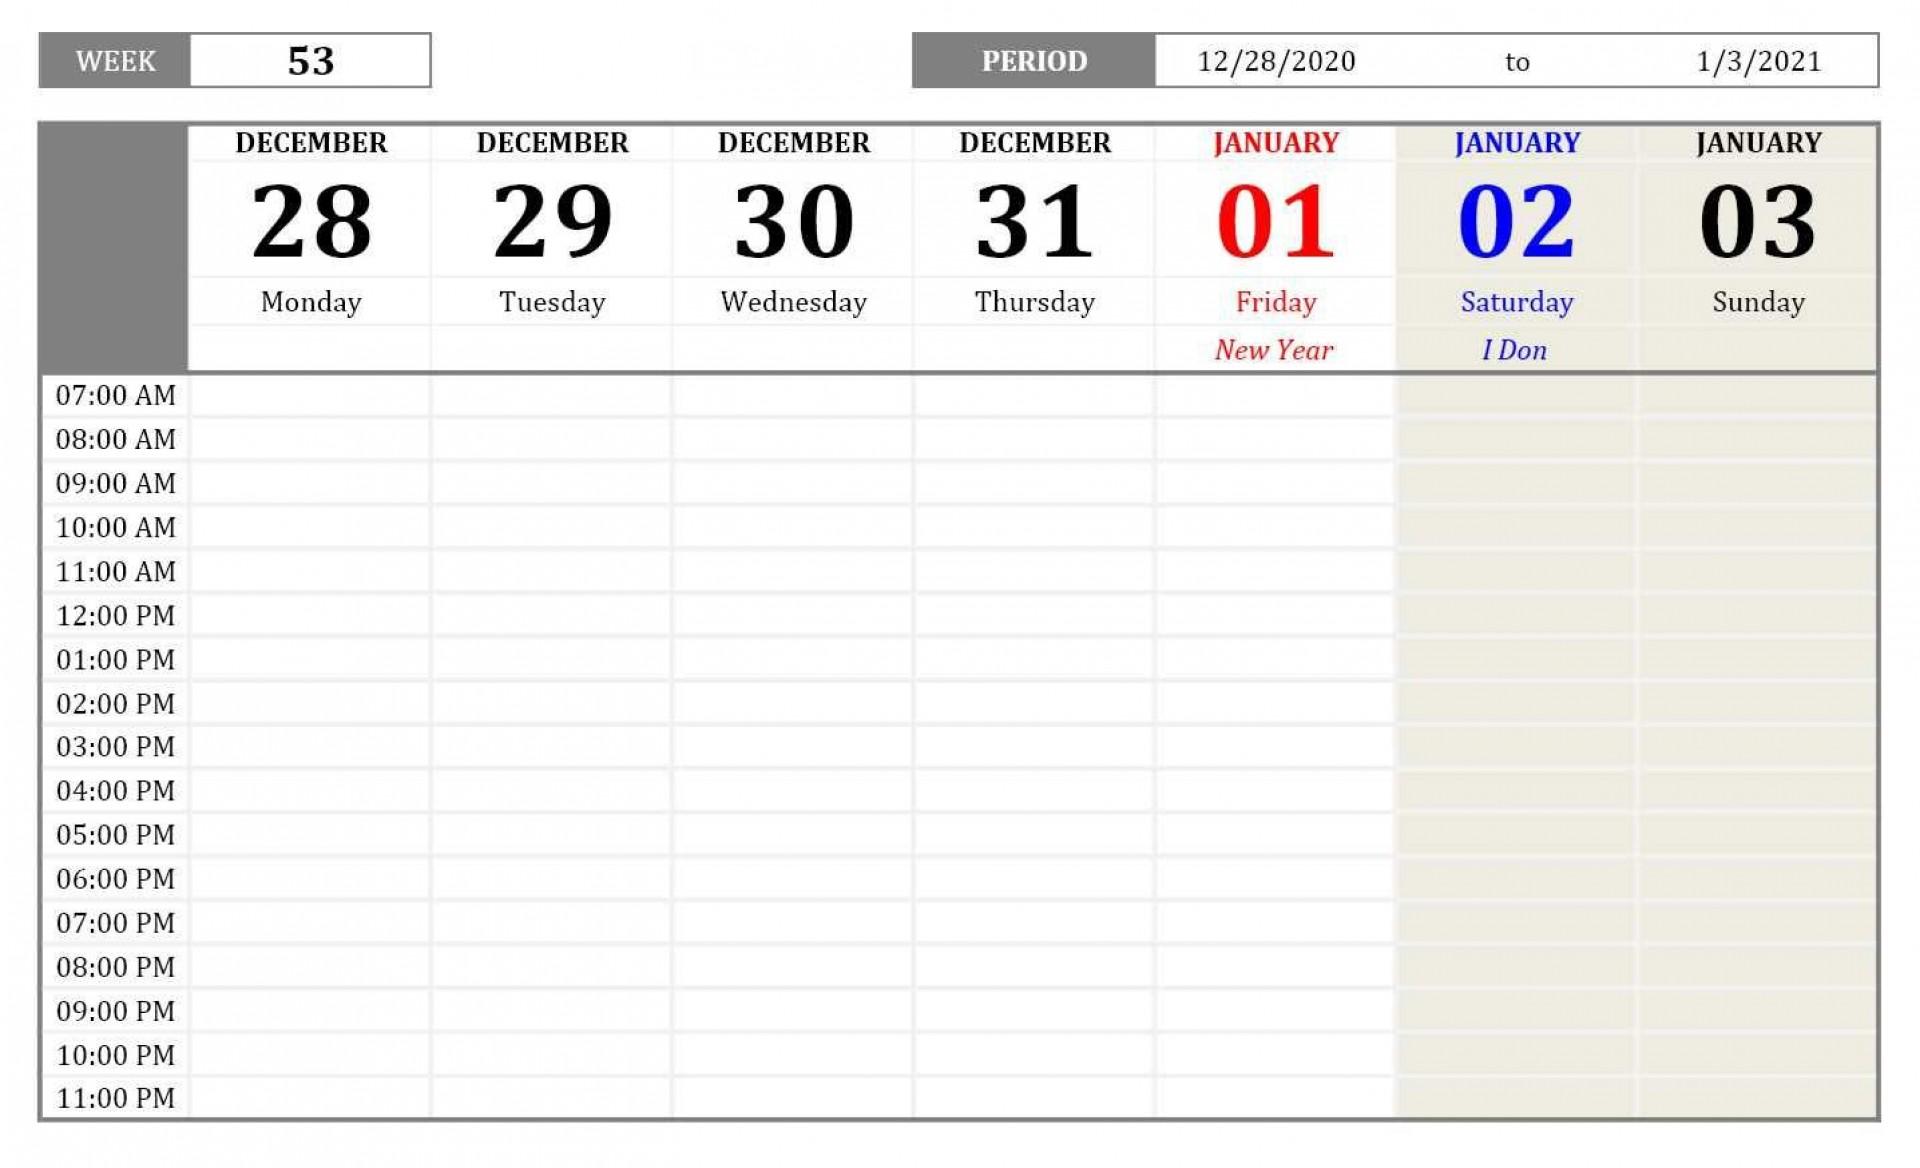 008 Exceptional 52 Week Calendar Template Excel Sample  2020 2019 20211920